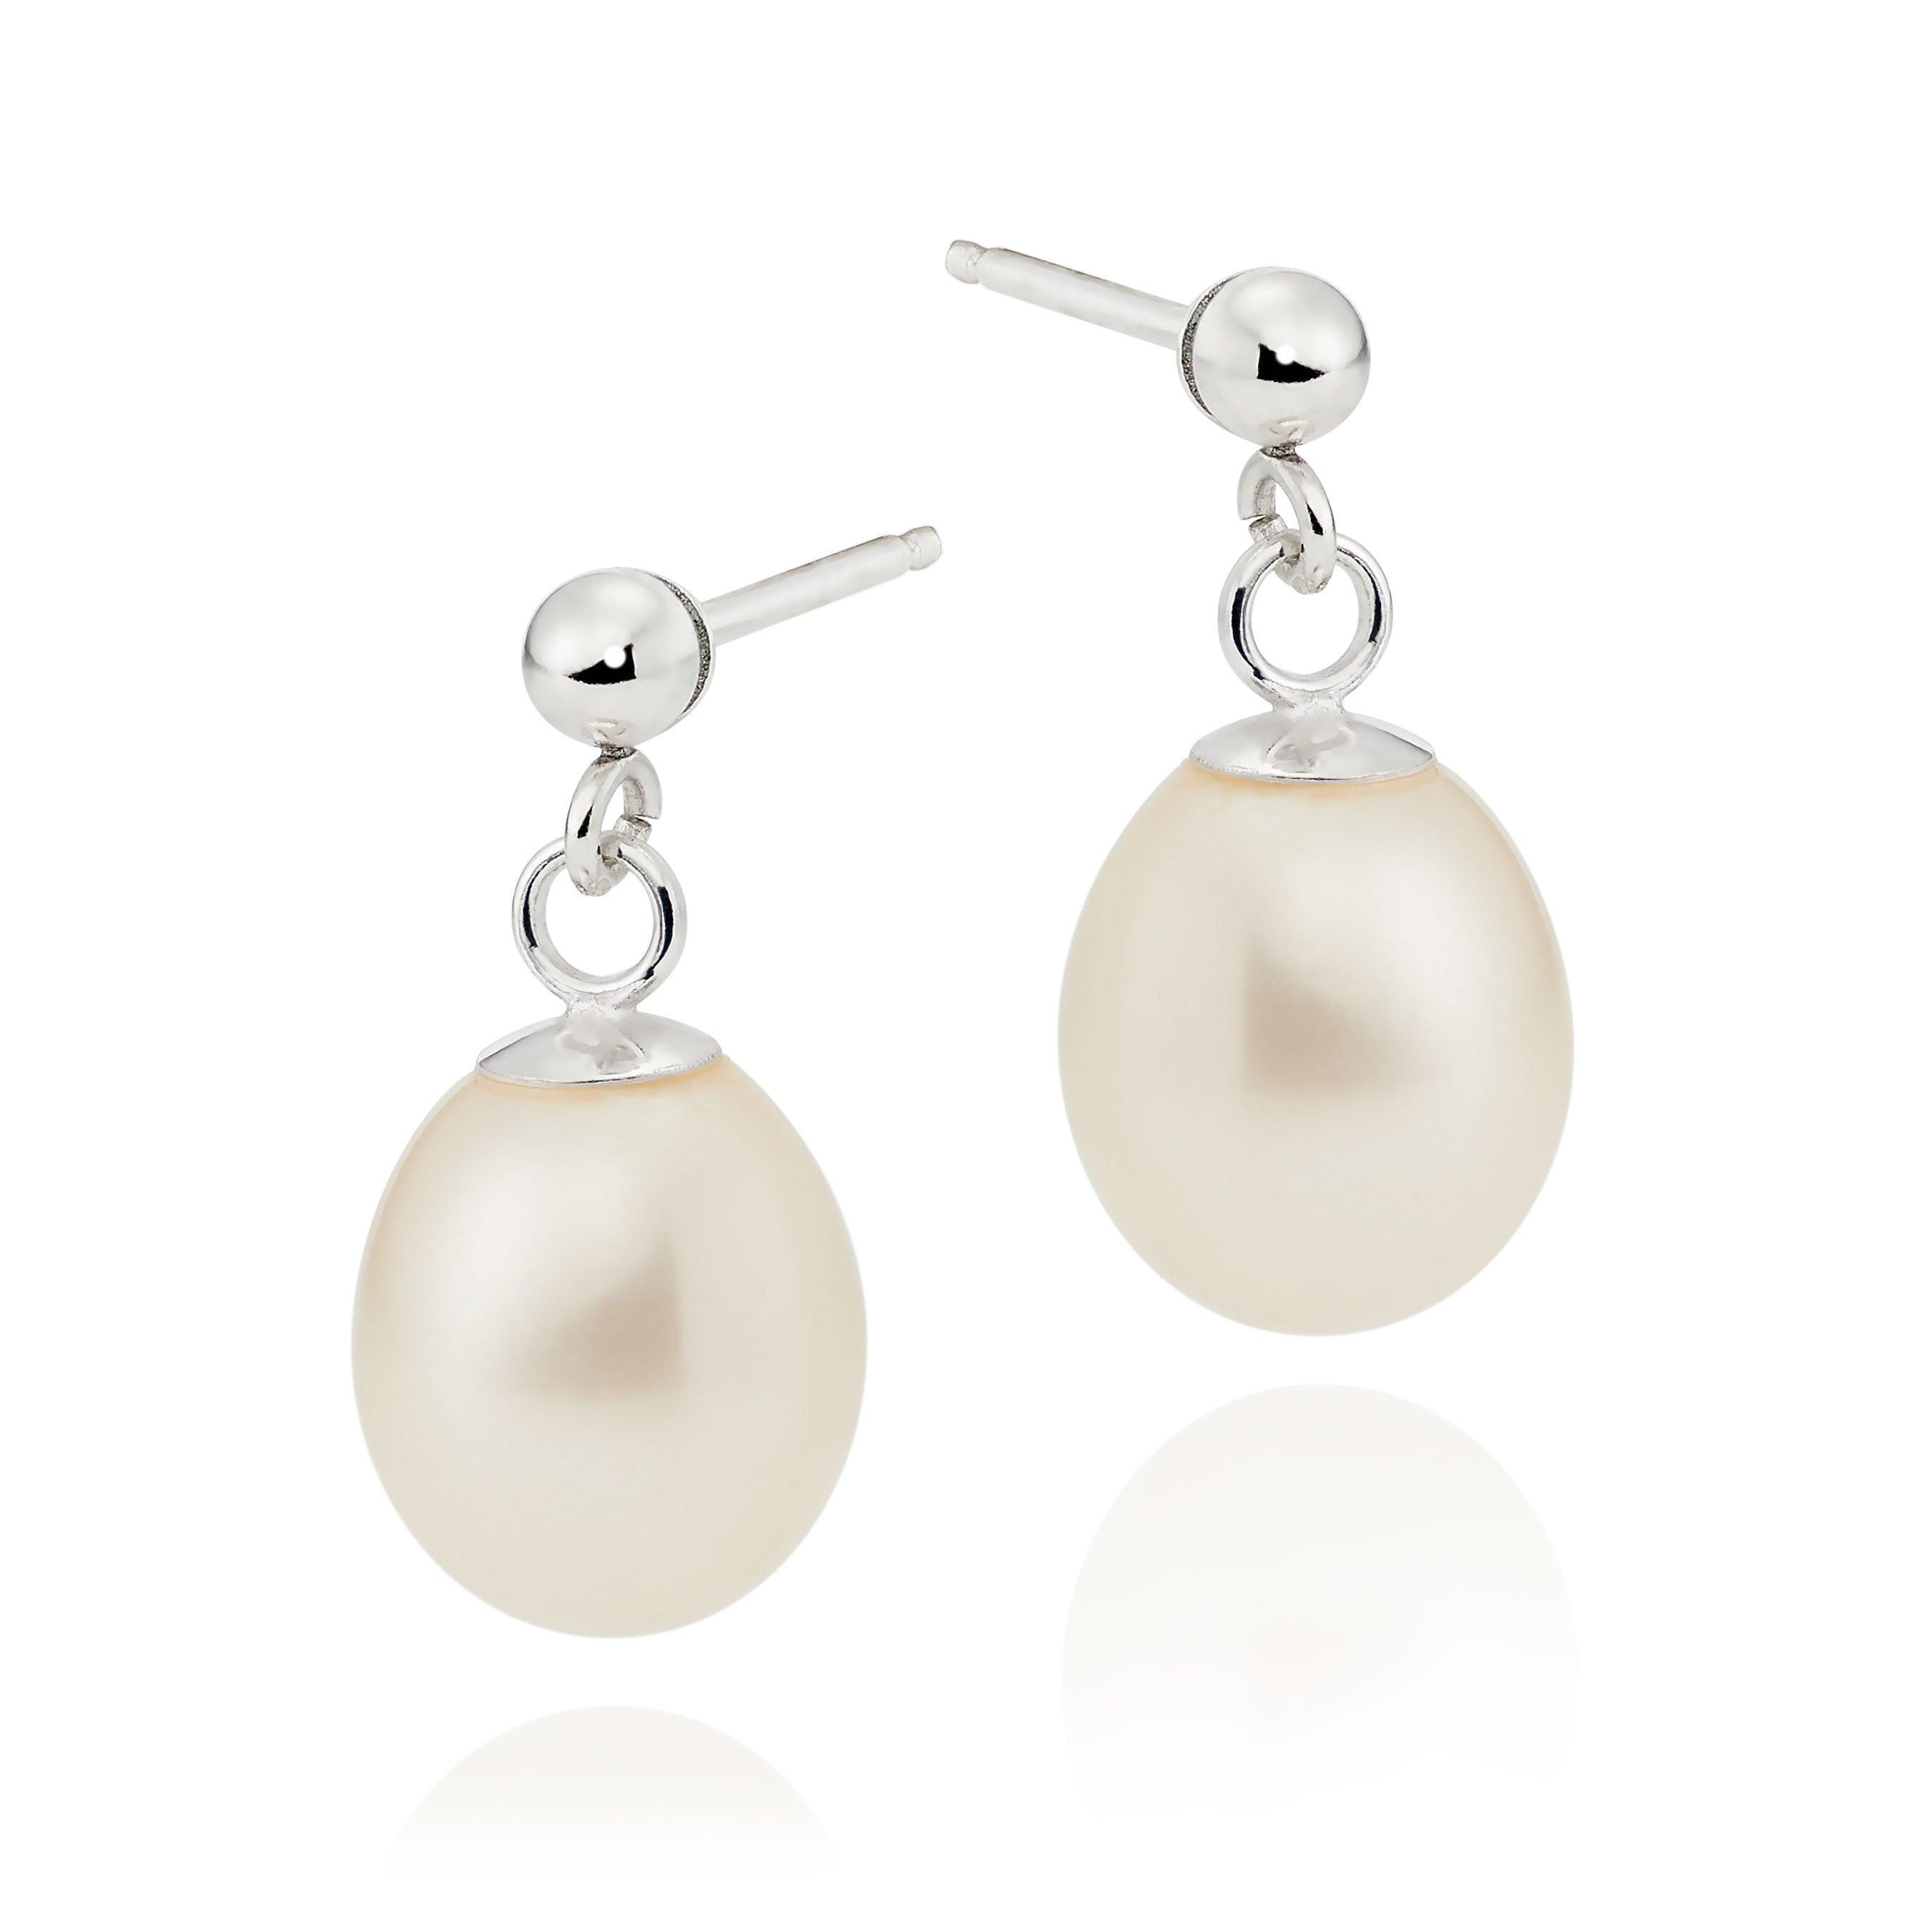 Silver Freshwater Cultured Pearl Drop Earrings